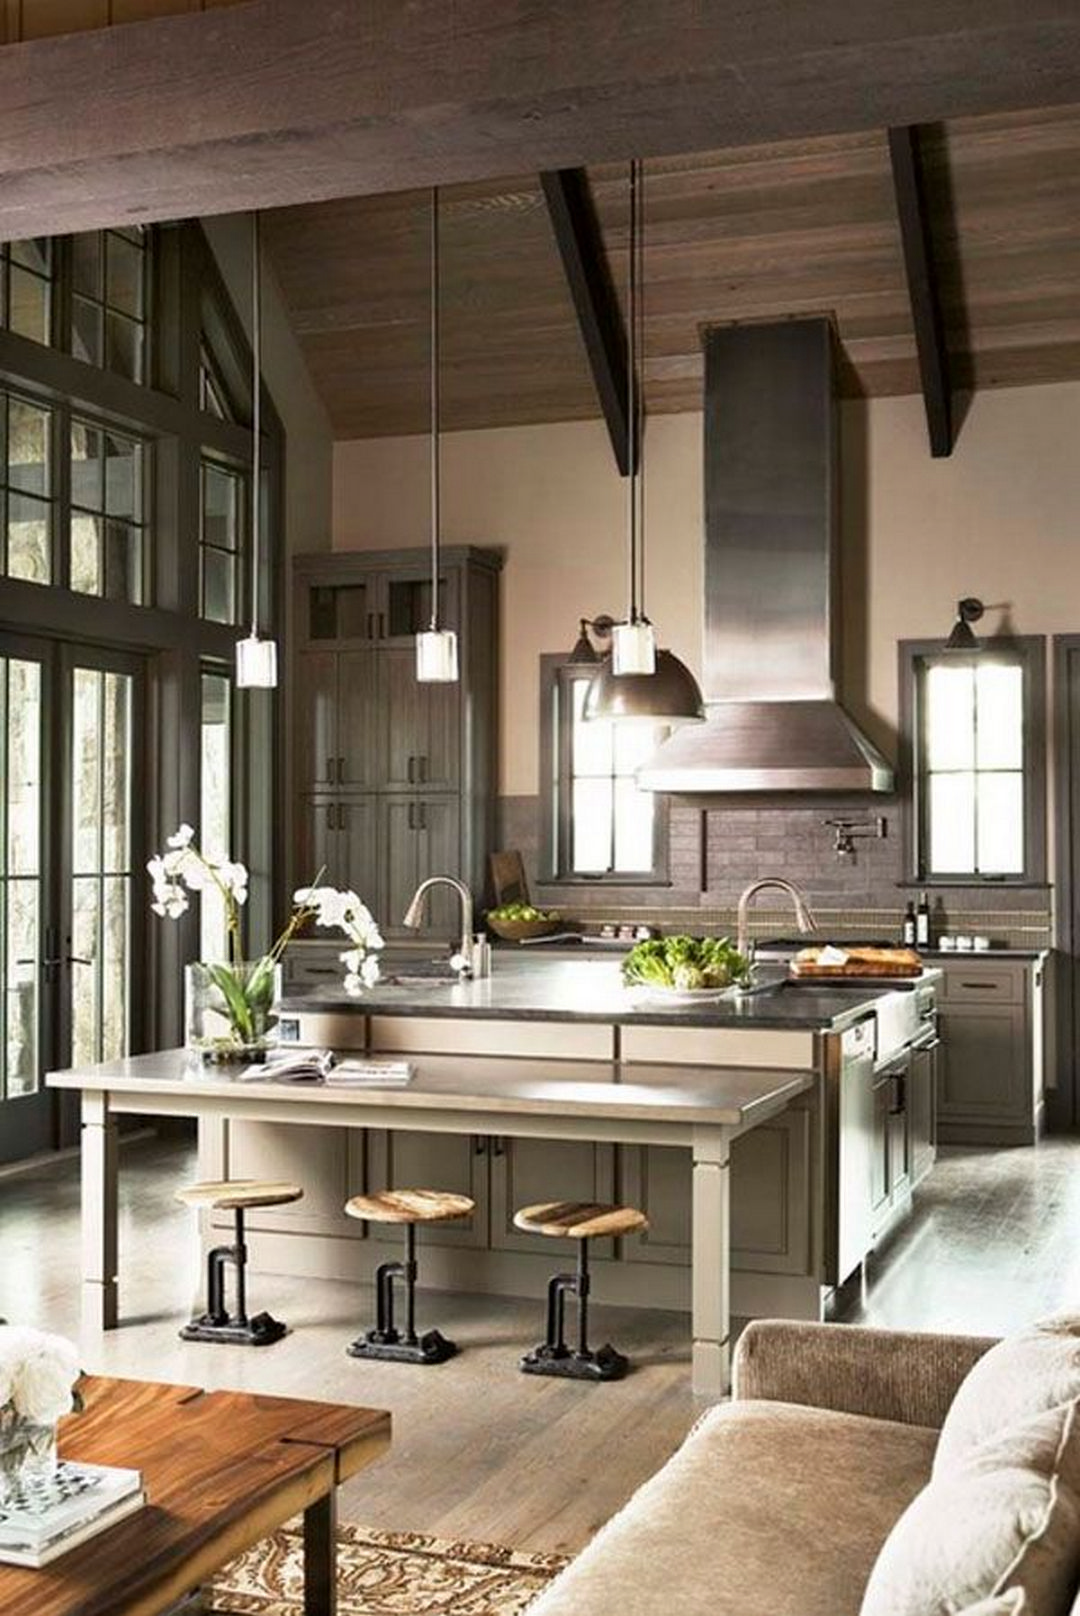 75 Beautiful Contemporary Kitchen Interior Design Ideas